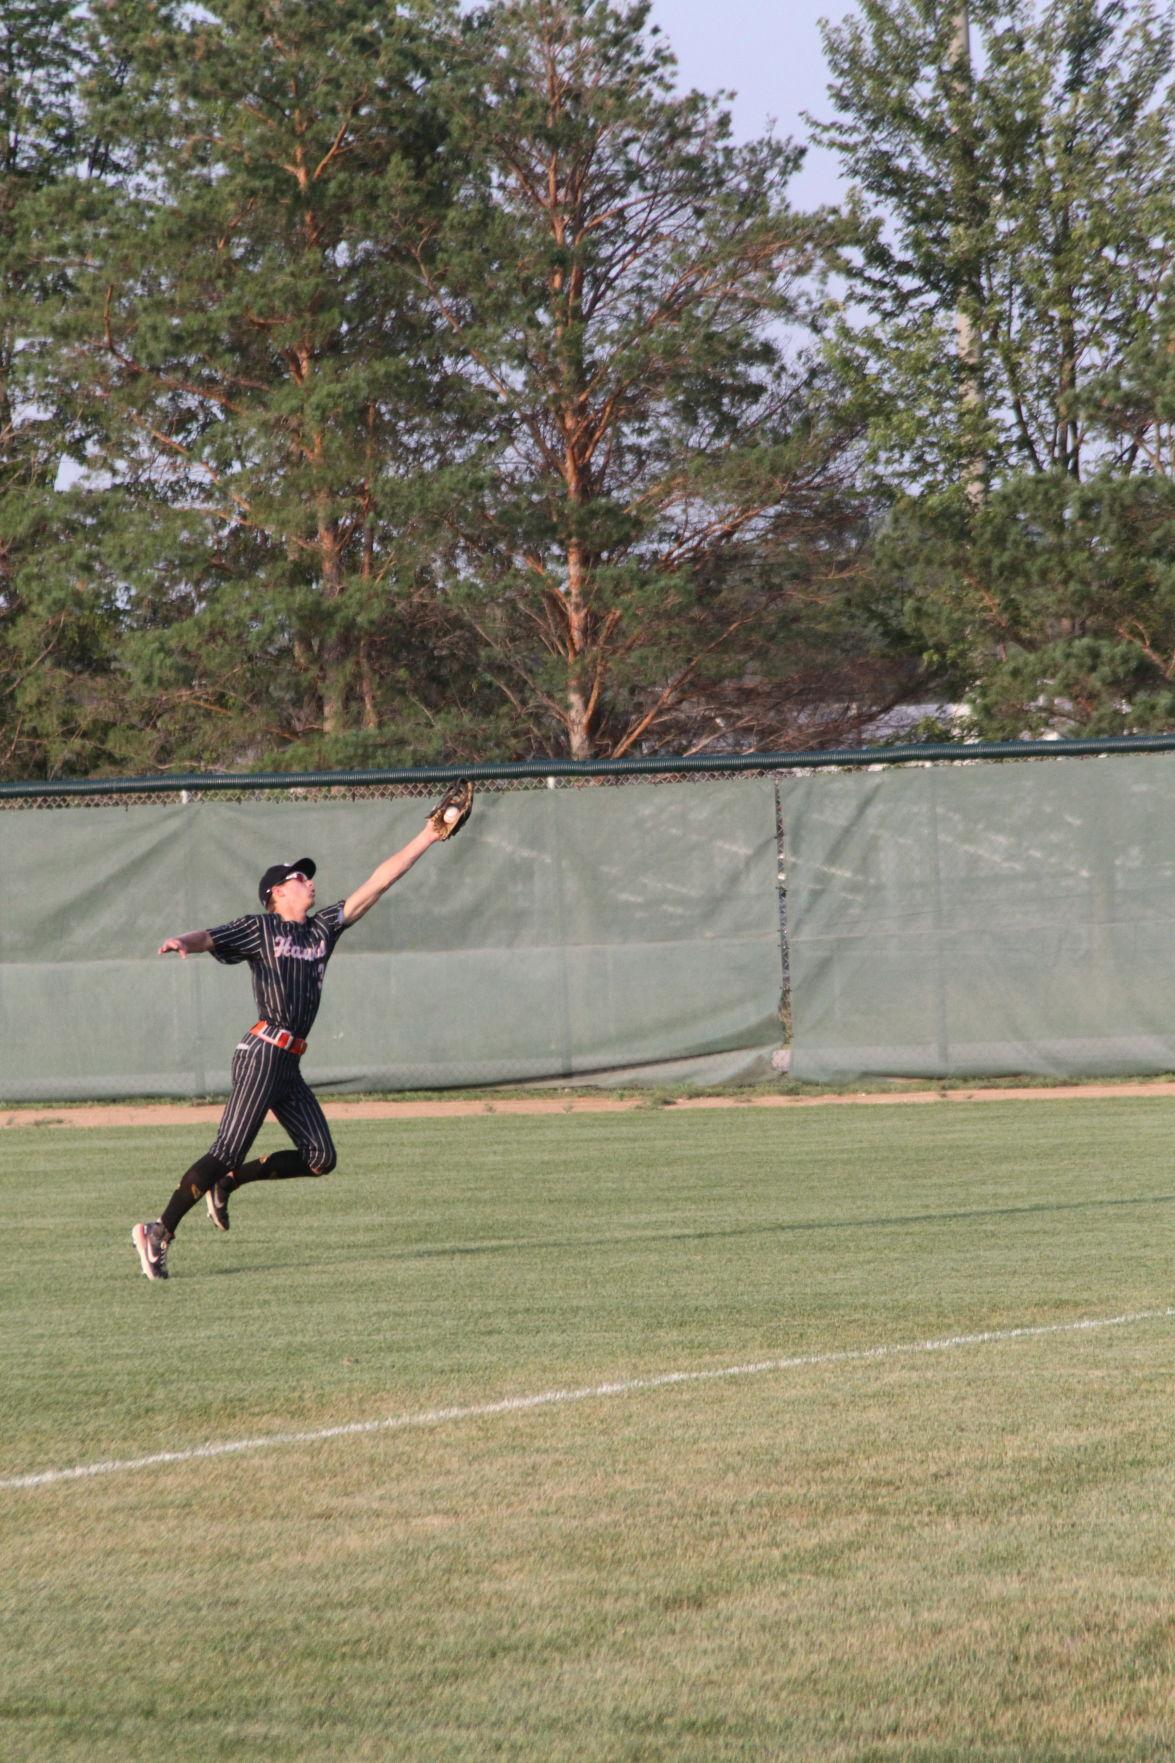 mpx-07212021-spt-hawk-baseball-ss-IMG_0425.JPG